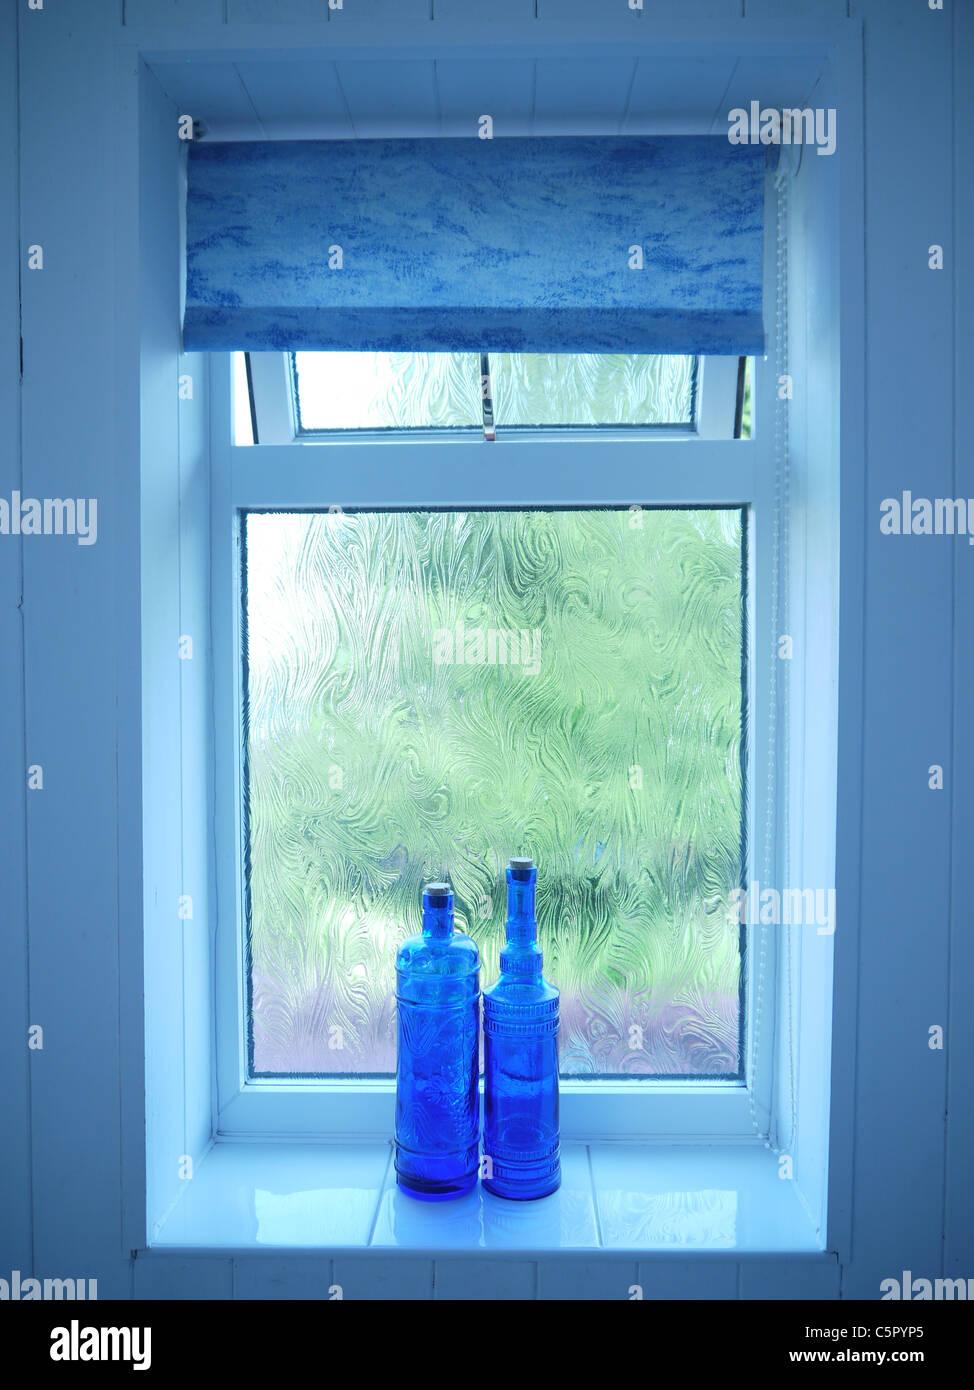 decorative glass bathroom windows two blue decorative bottles sitting on a bathroom window sill  two blue decorative bottles sitting on